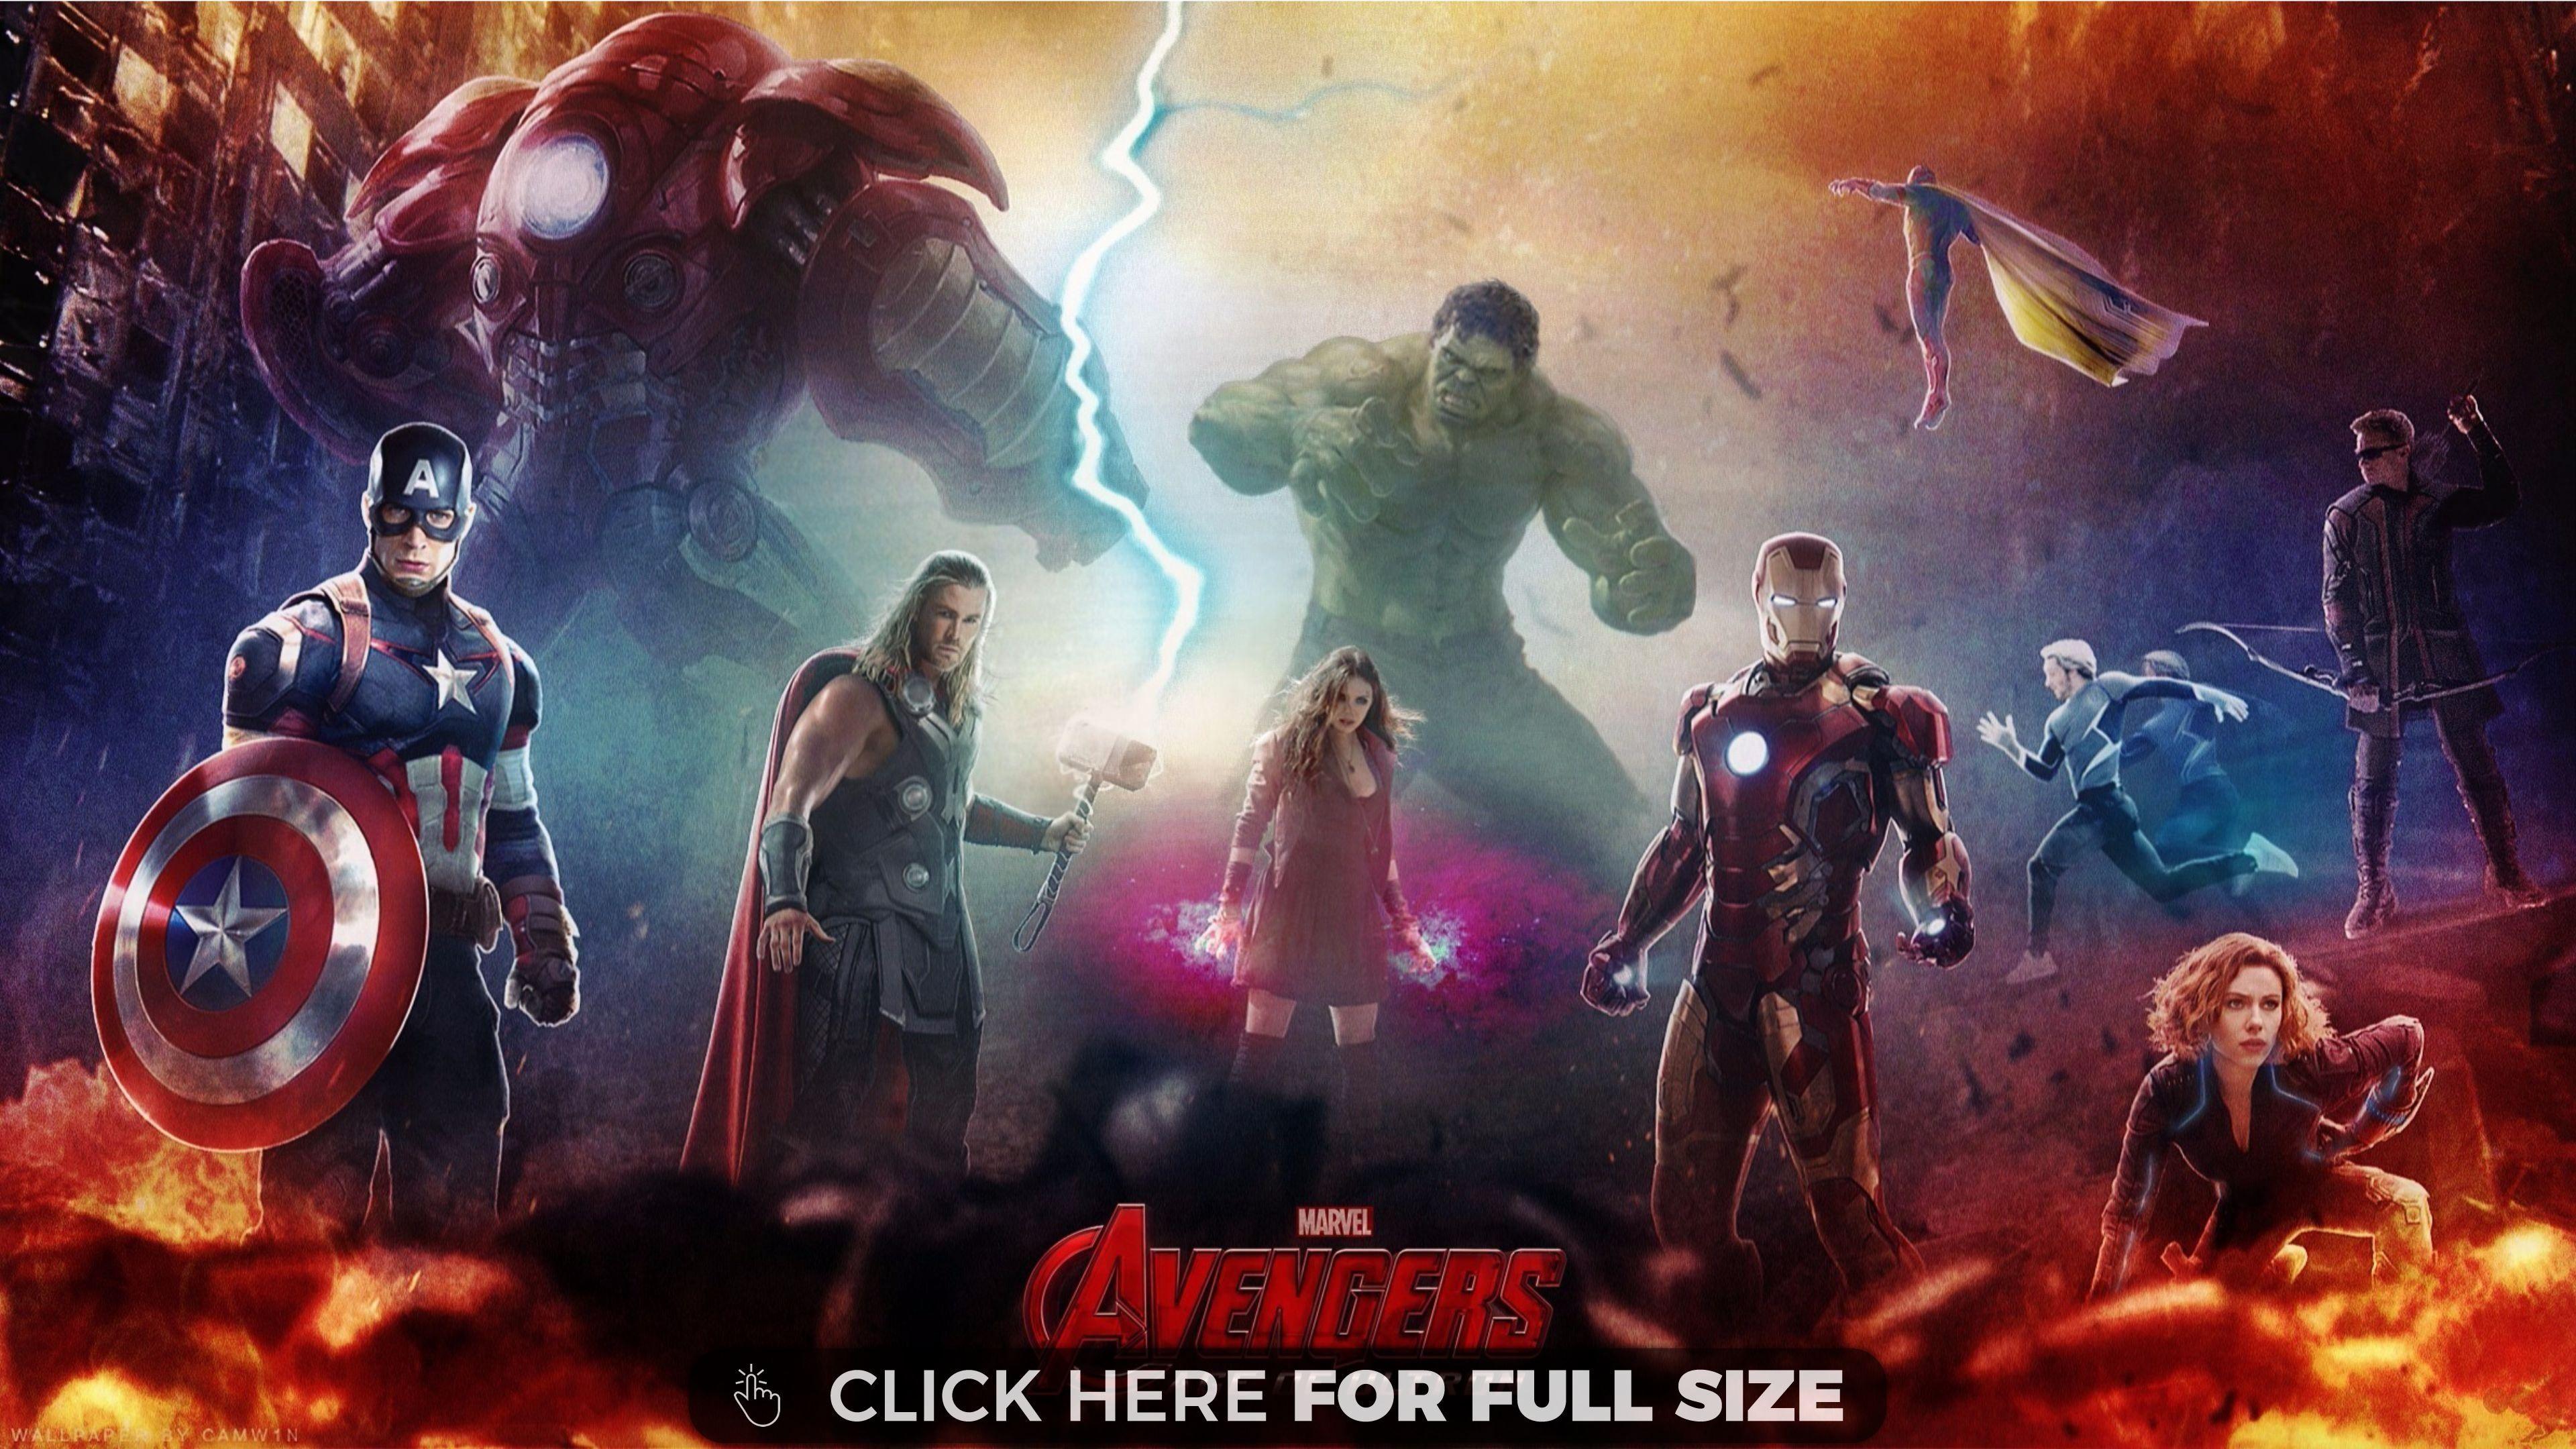 Most Inspiring Wallpaper Marvel Avengers Age Ultron - 0cf81eb5f17249027b05b985141fc0aa  Trends_38549.jpg